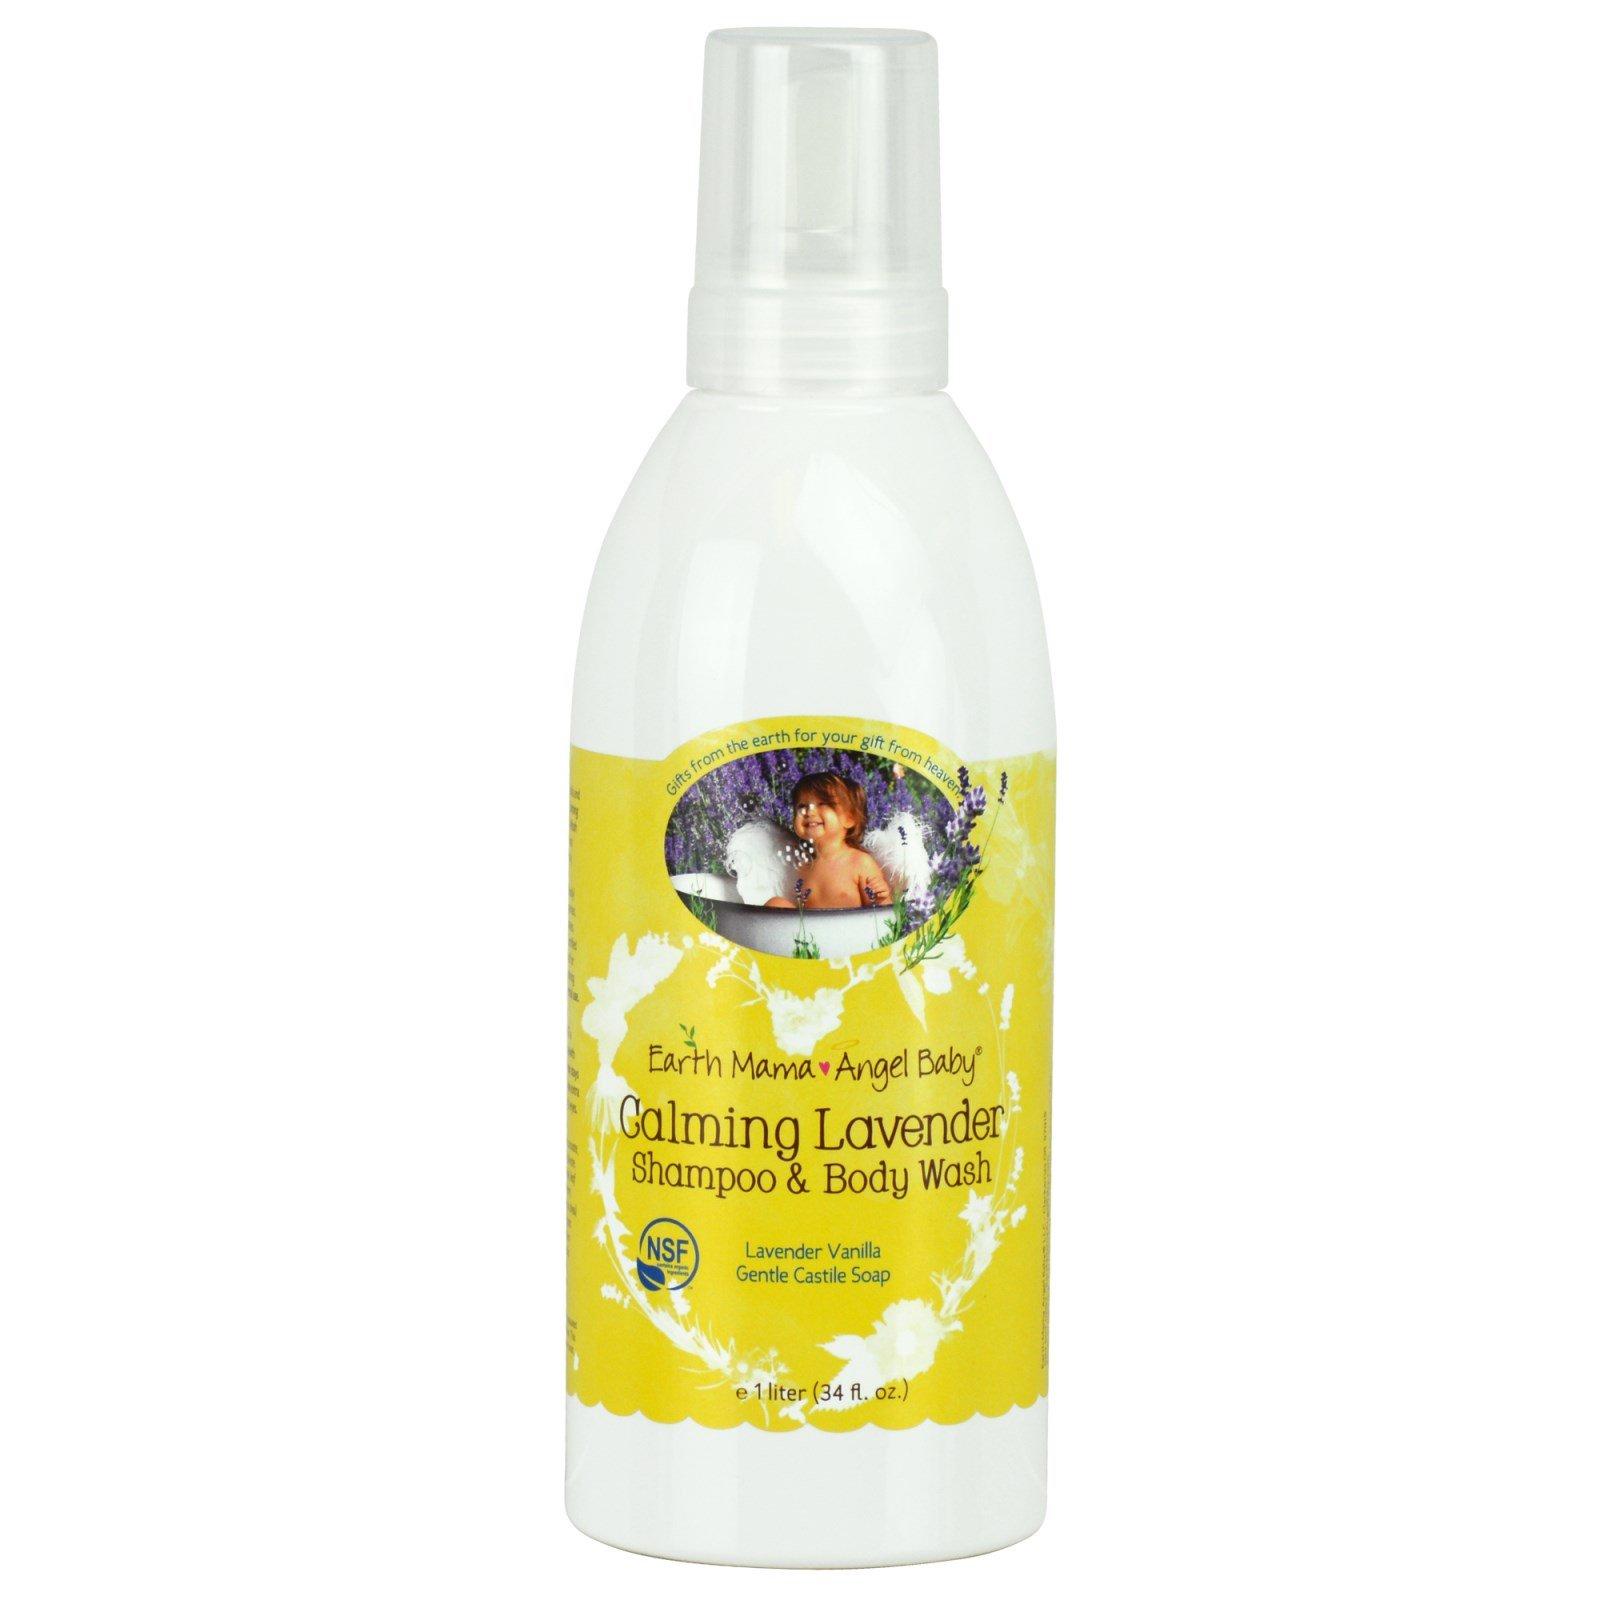 Earth Mama Angel Baby, Calming Lavender Shampoo & Body Wash, Lavender Vanilla, 34 fl oz (1 L) - 3PC